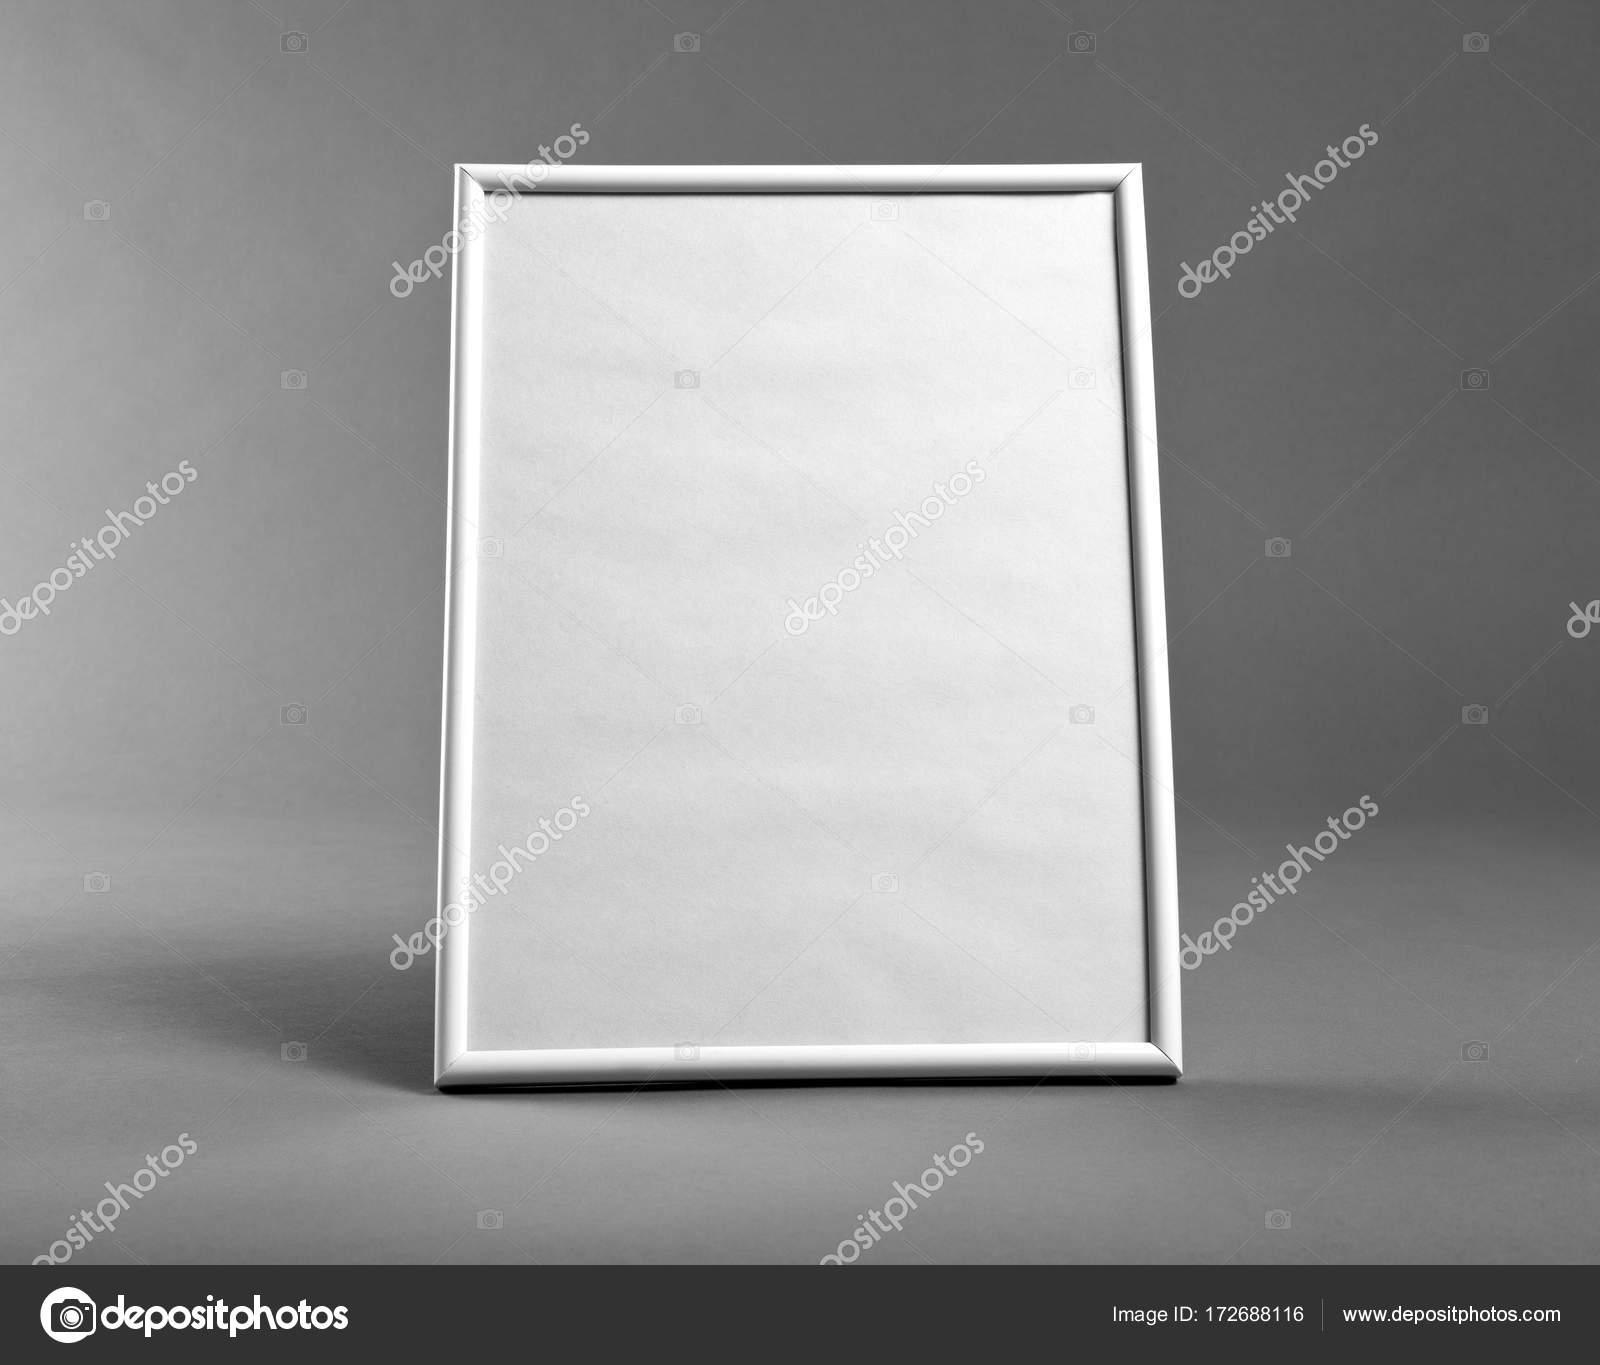 White vertical frame for paintings or photographs on gray backgr ...